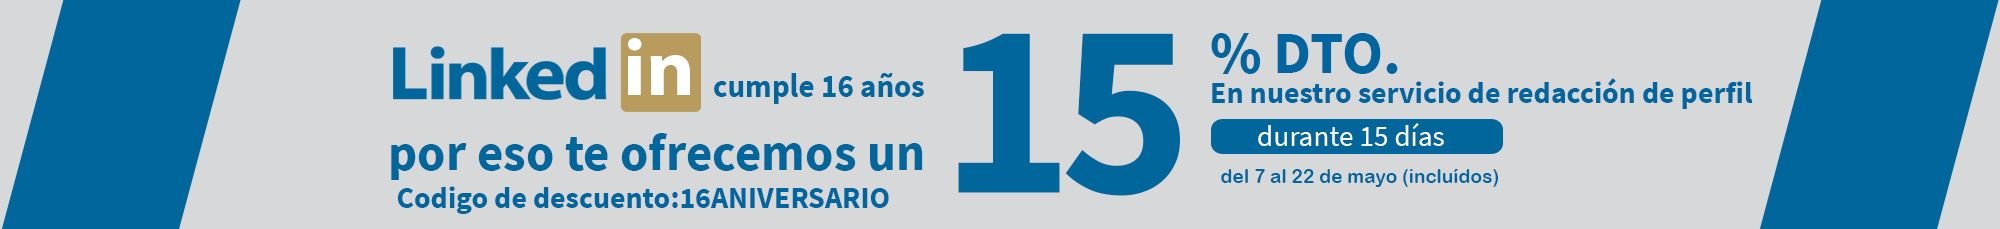 Promoción 16 aniversario LinkedIn